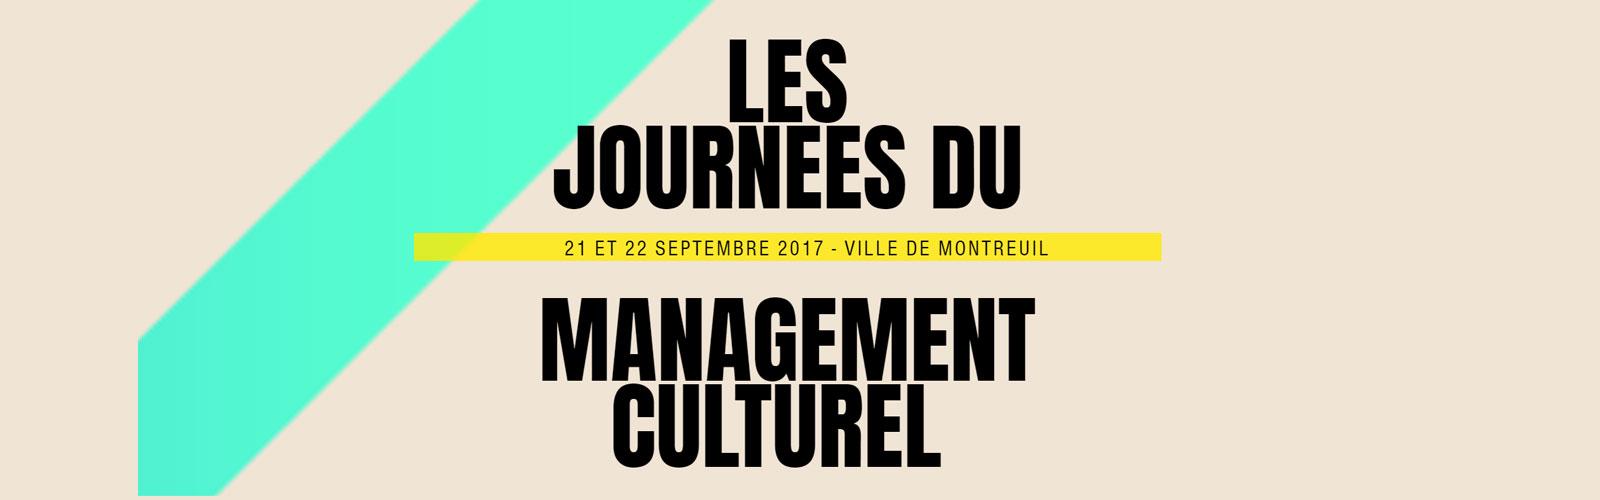 journee-management-culturel